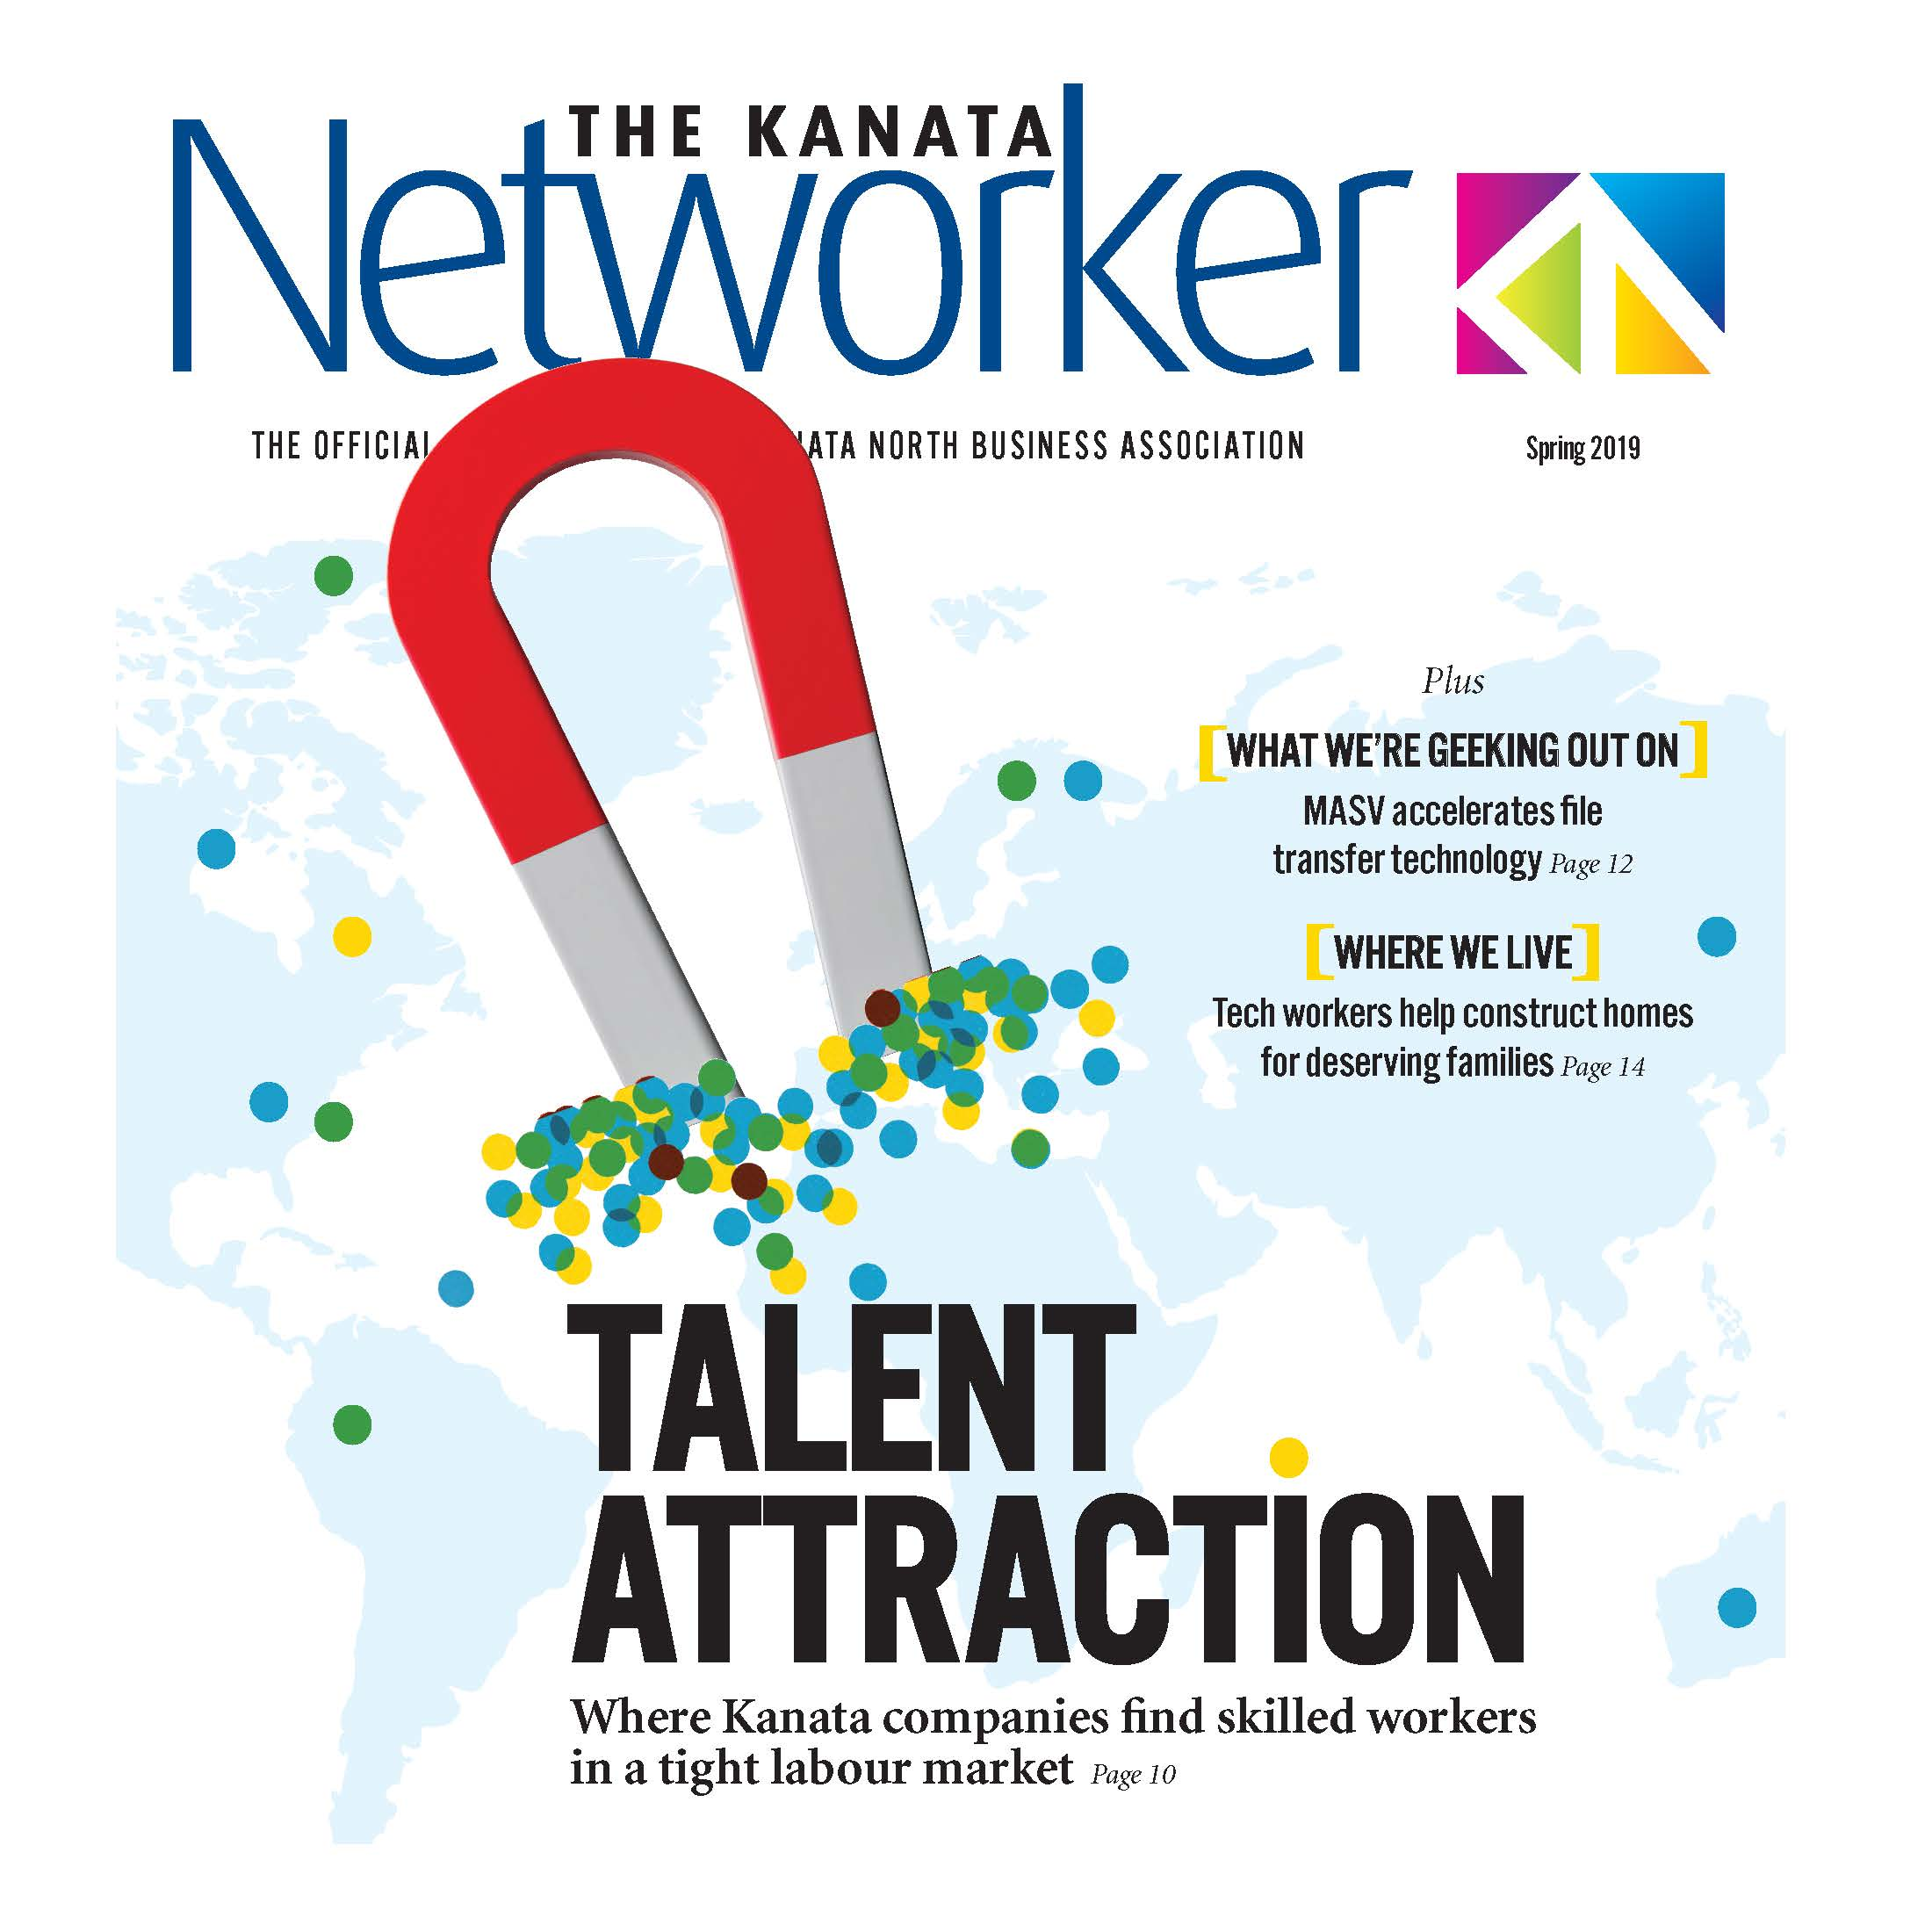 kanata-networker-spring-2019